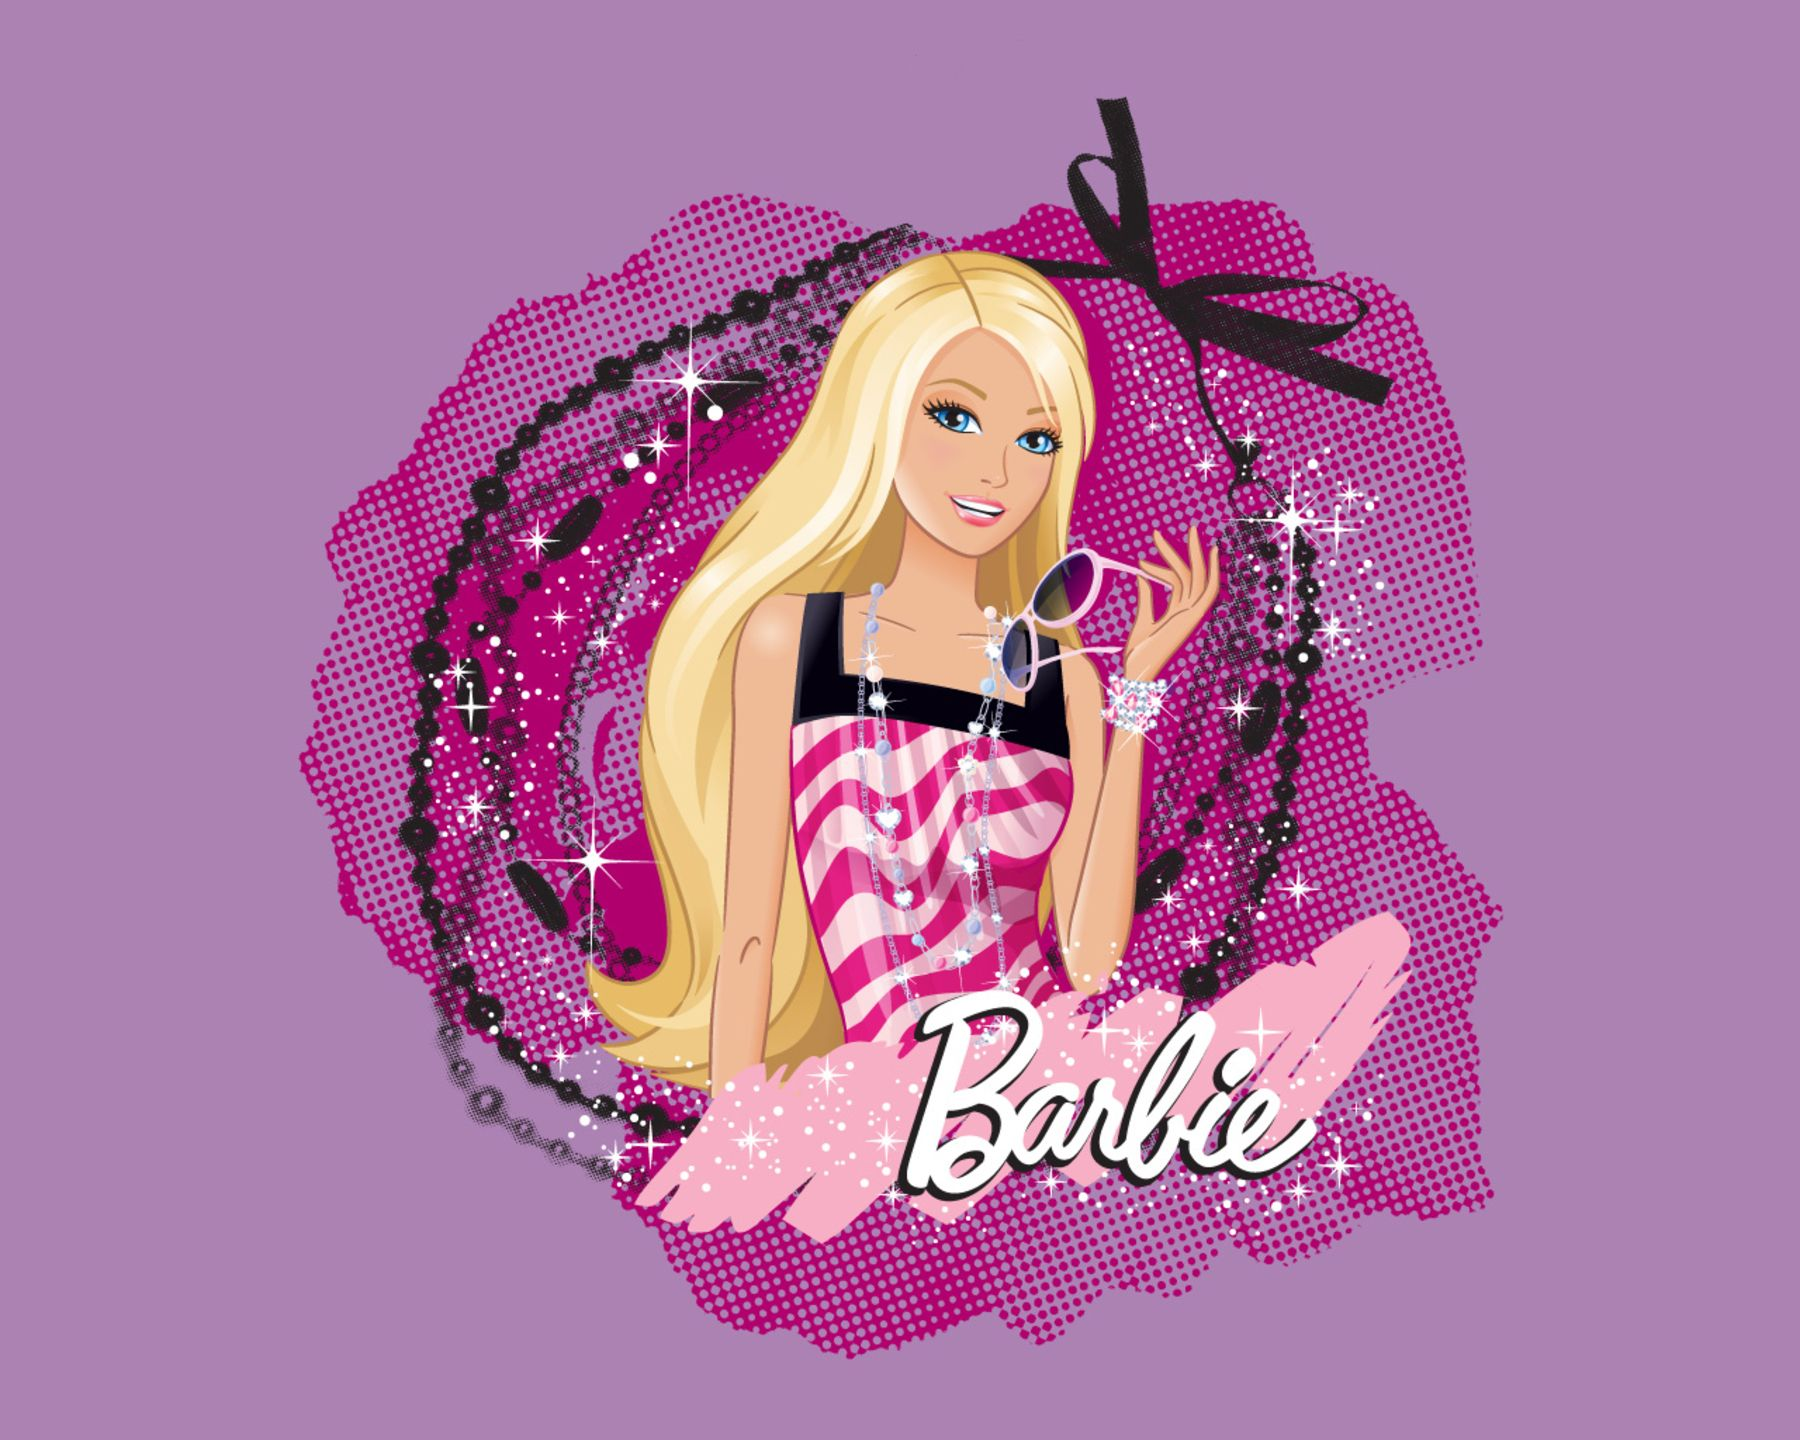 Barbie Wallpaper Hd: Barbie Cartoon Wallpaper HD